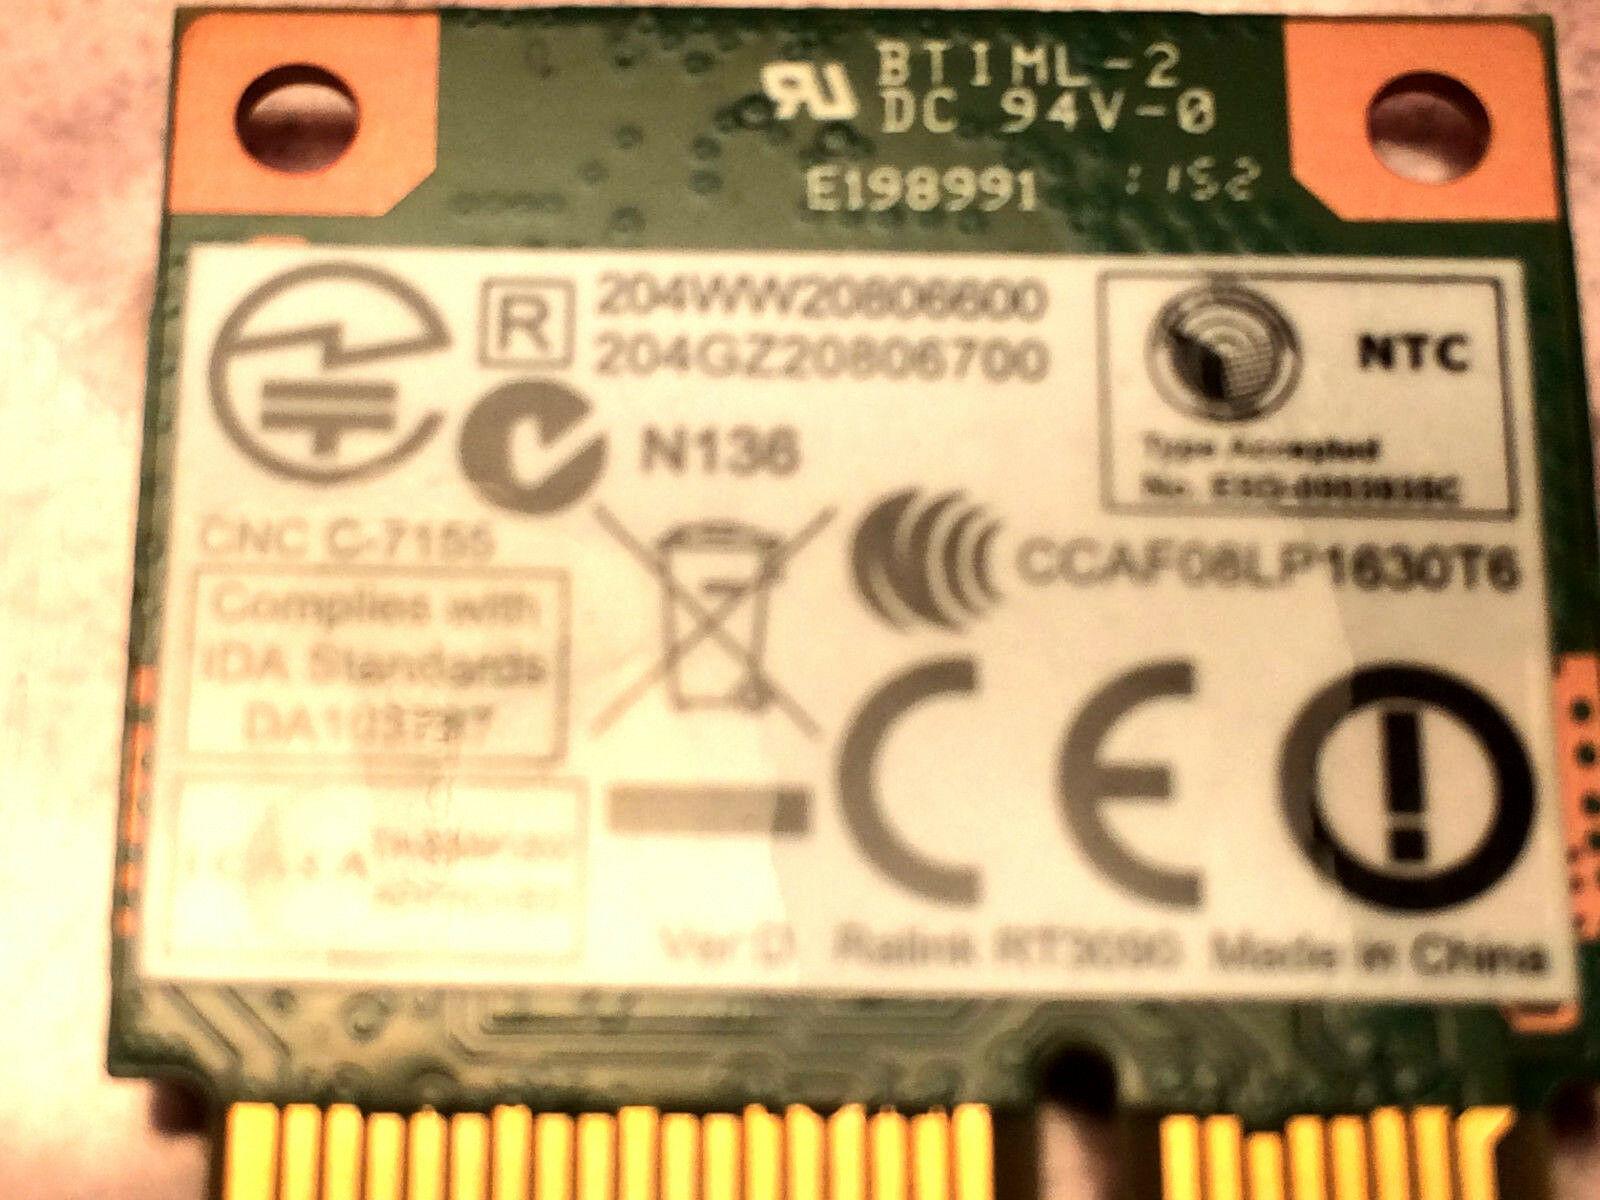 Ralink RT3090 802.11b/g/n PCI-E Half mini Wireless RT3090-1T1R New image 3